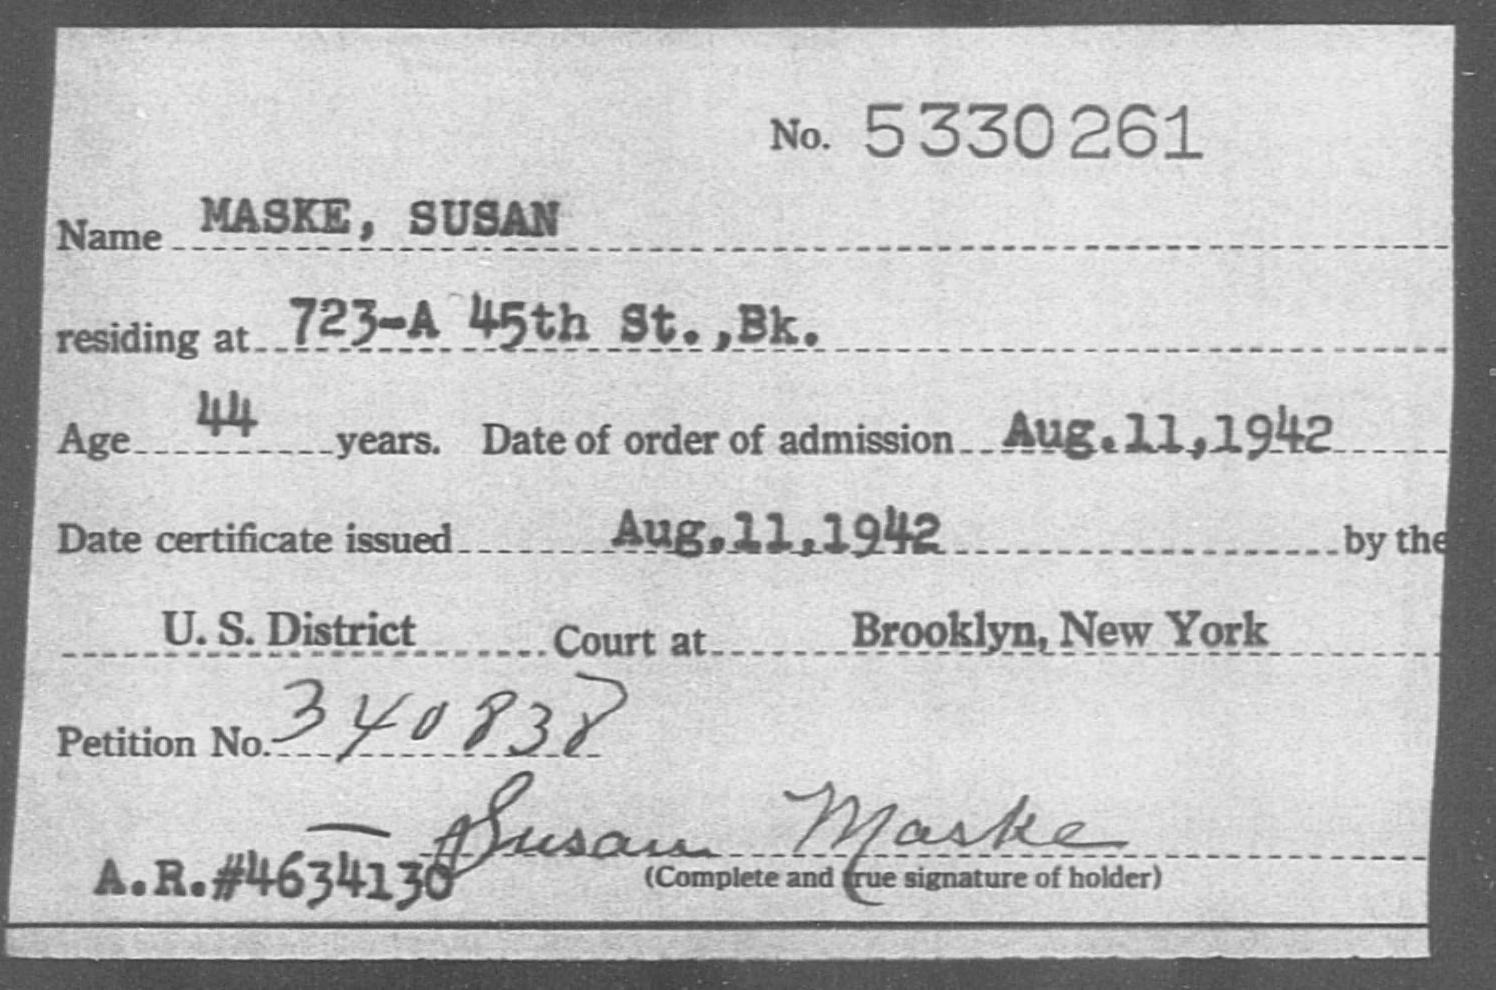 MASKE, SUSAN - Born: [BLANK], Naturalized: 1942